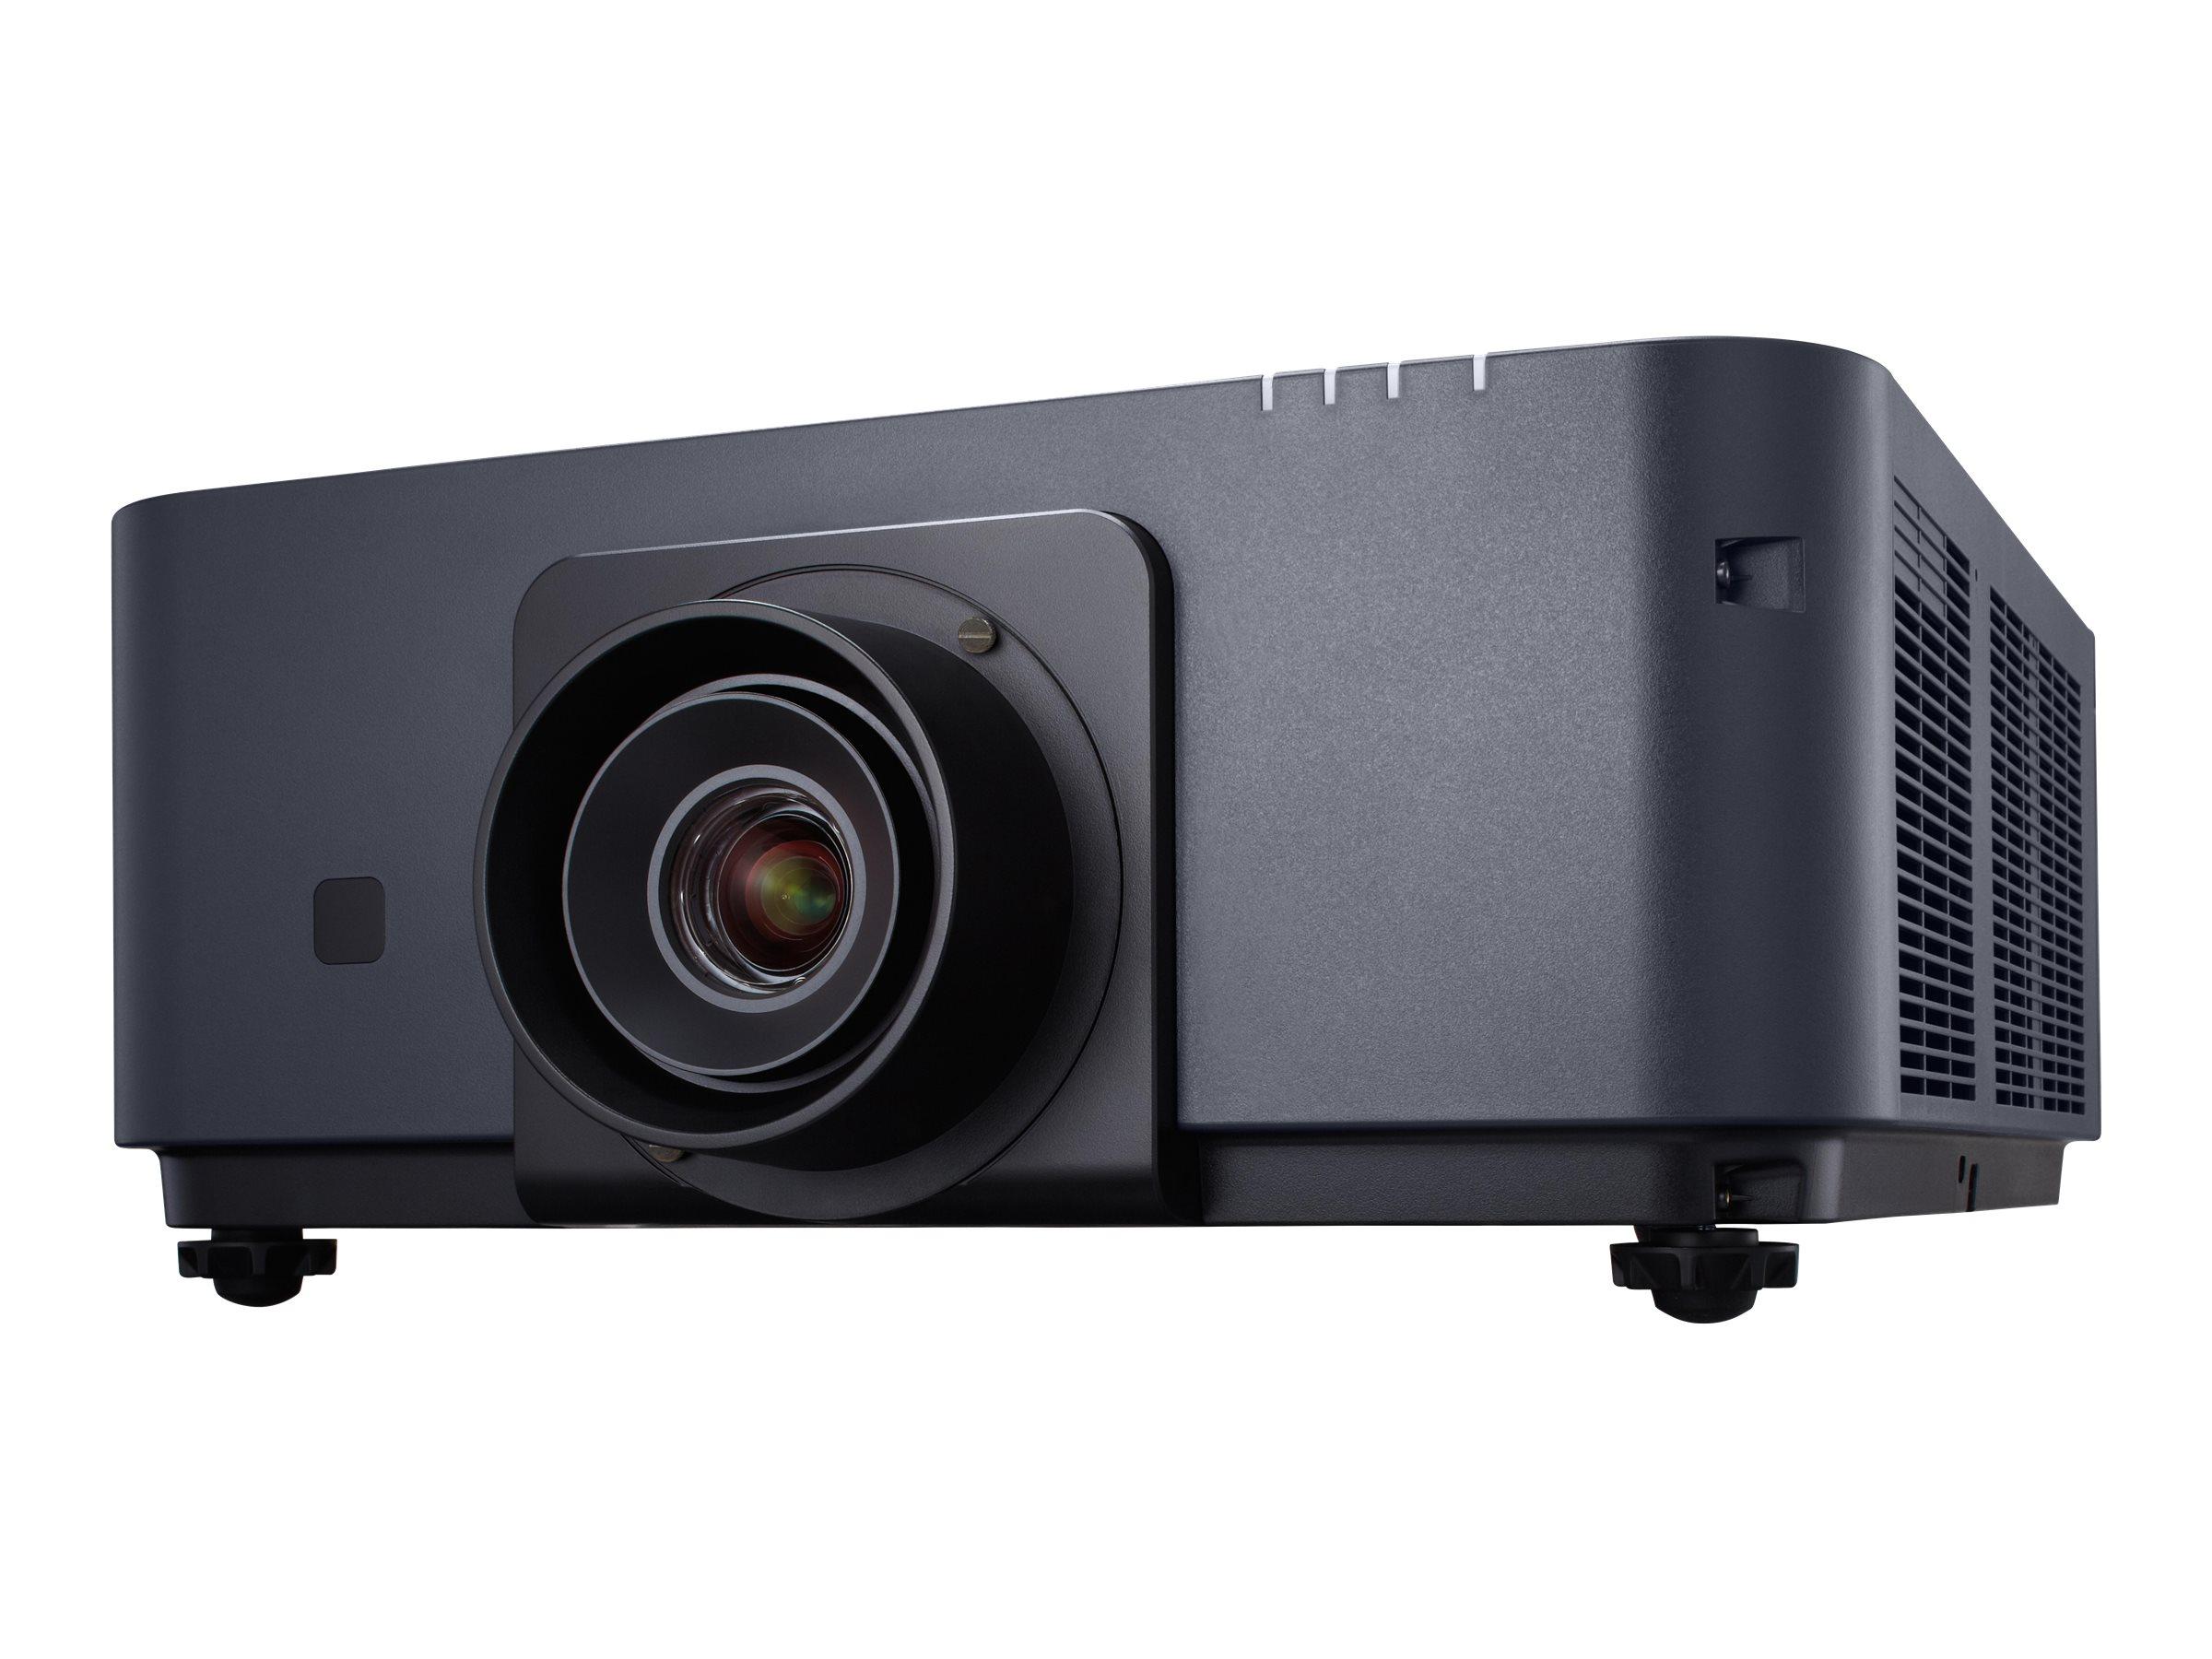 NEC PX602UL - DLP-Projektor - Laserdiode - 3D - 6000 ANSI-Lumen - WUXGA (1920 x 1200)